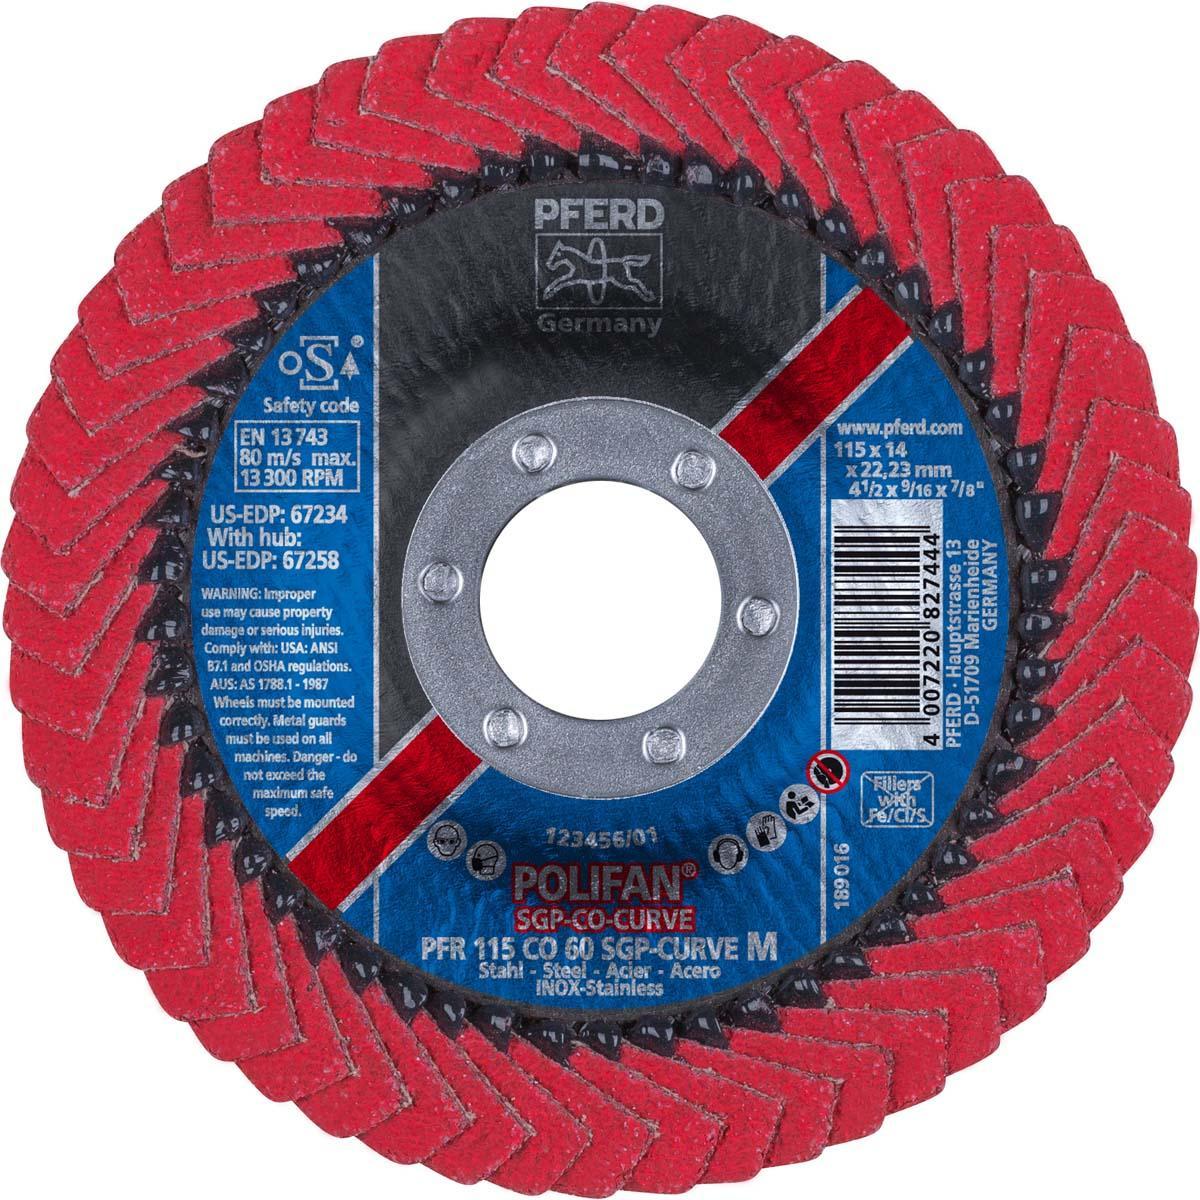 "4-1/2"" x 7/8"" POLIFAN® CURVE Flap Disc SGP, Ceramic Oxide, 60 Grit, Medium Radius"